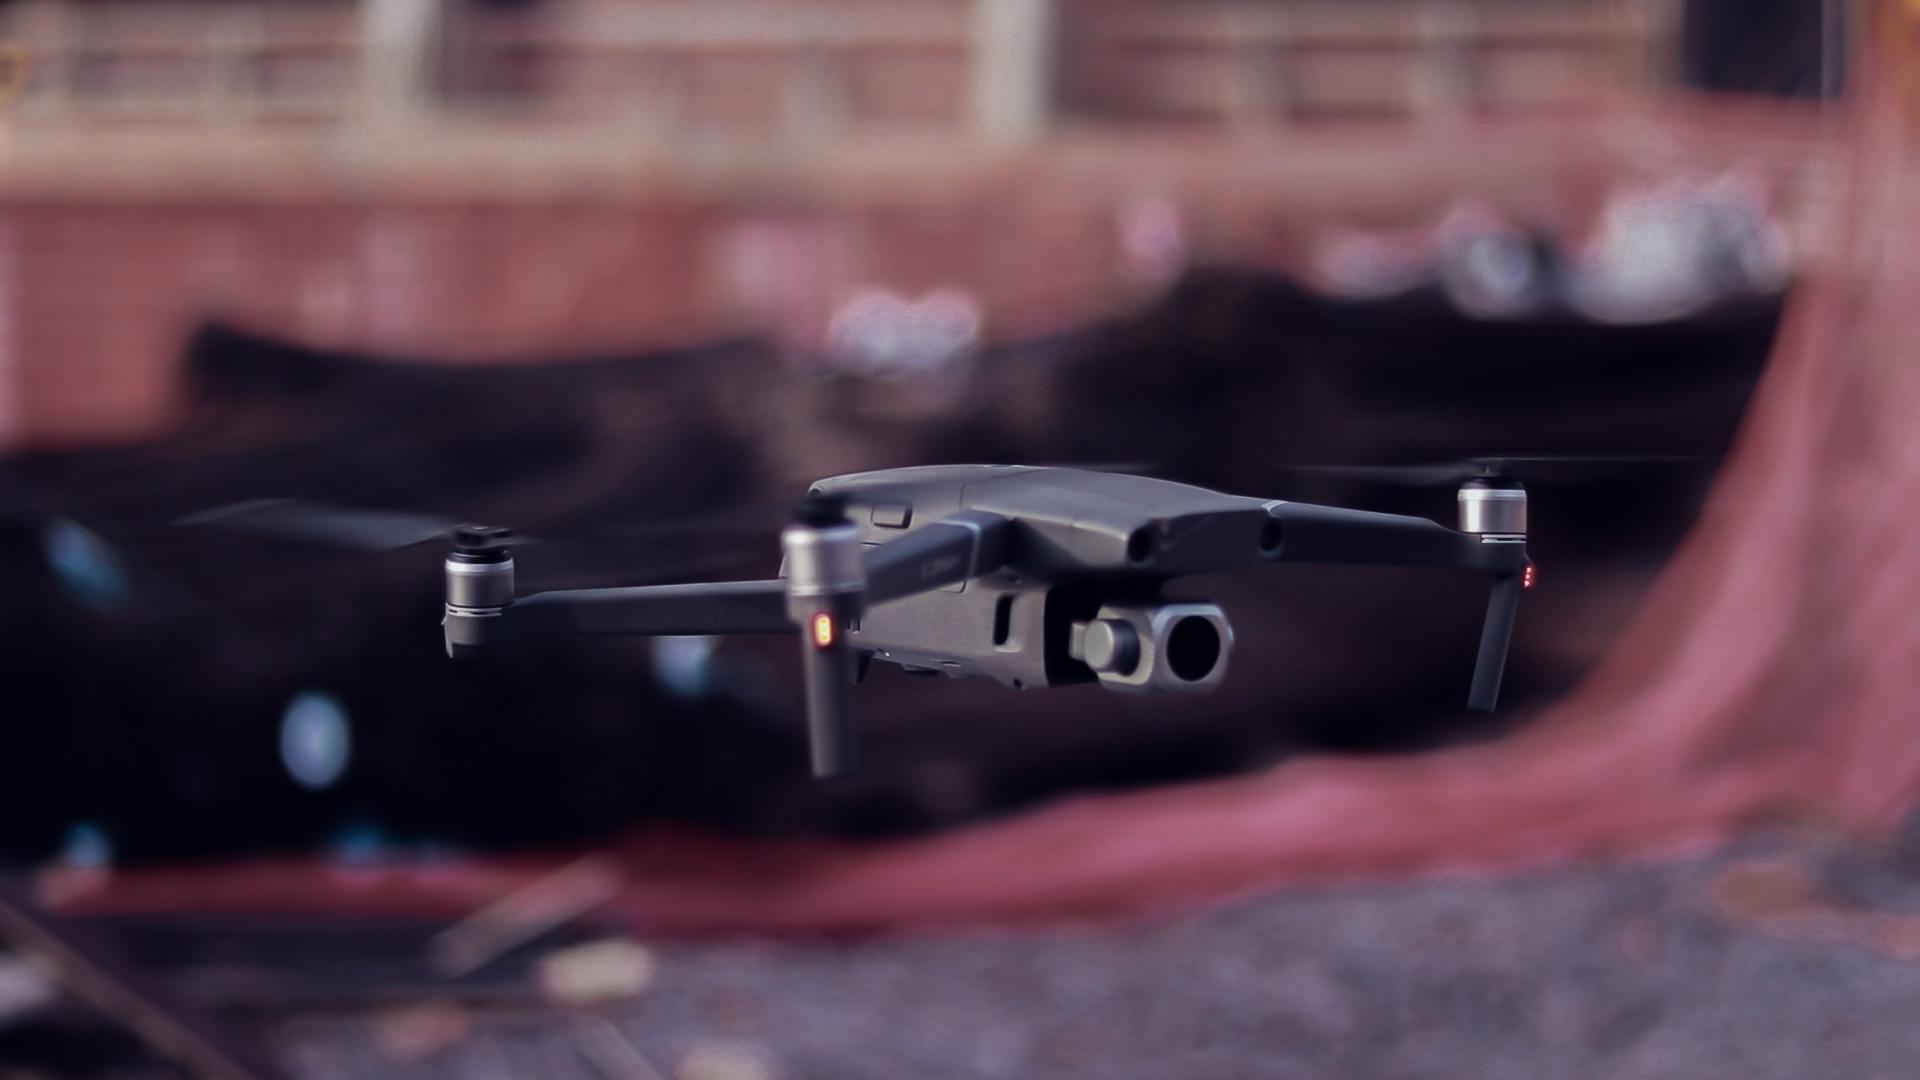 A tendência dos drones na produção audiovisual